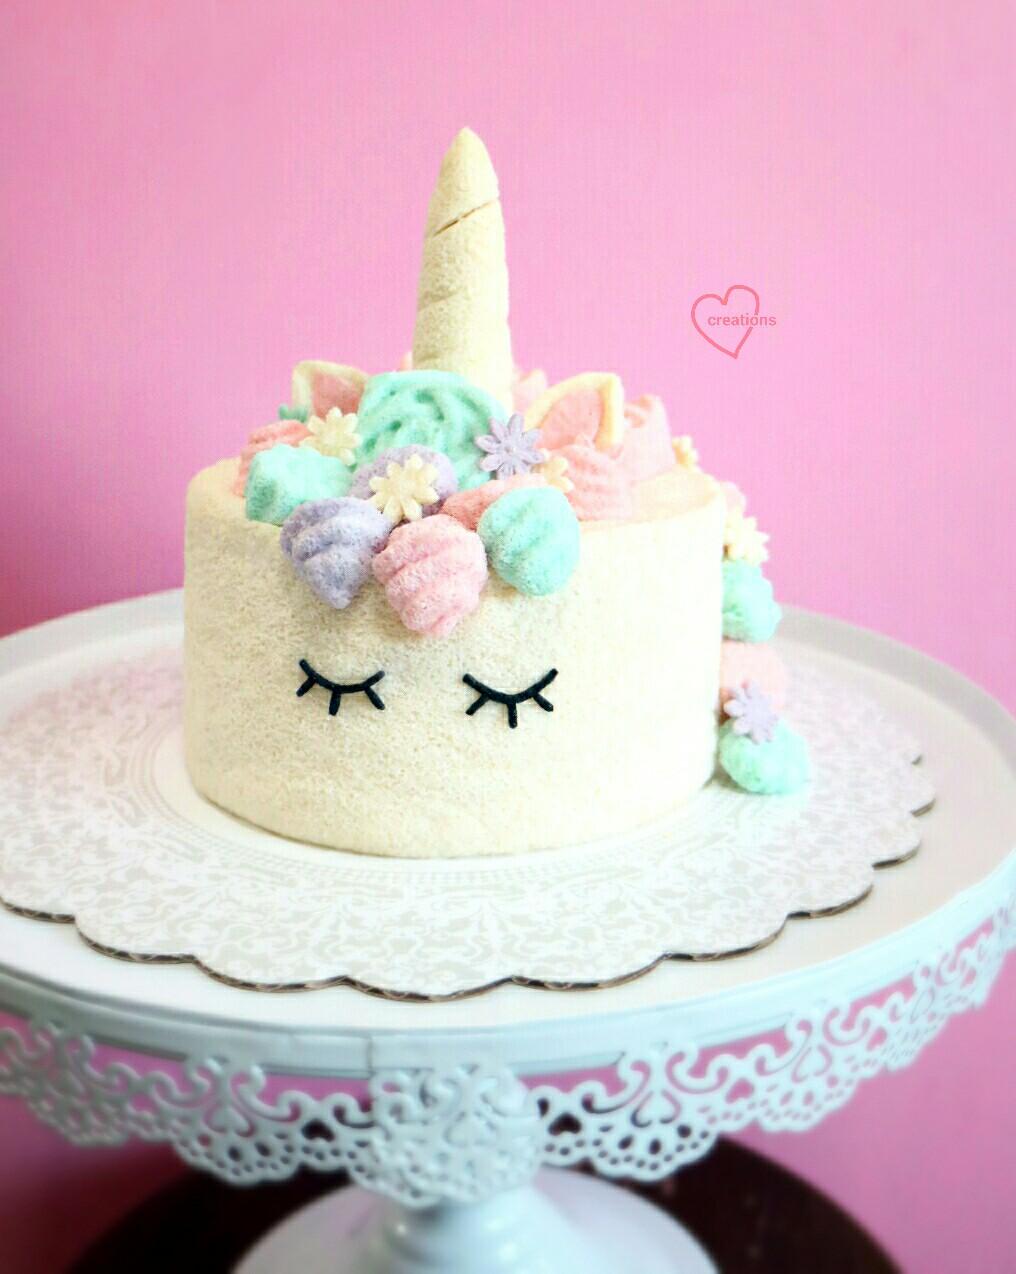 Loving Creations For You Unicorn Soy Milk Chiffon Cake